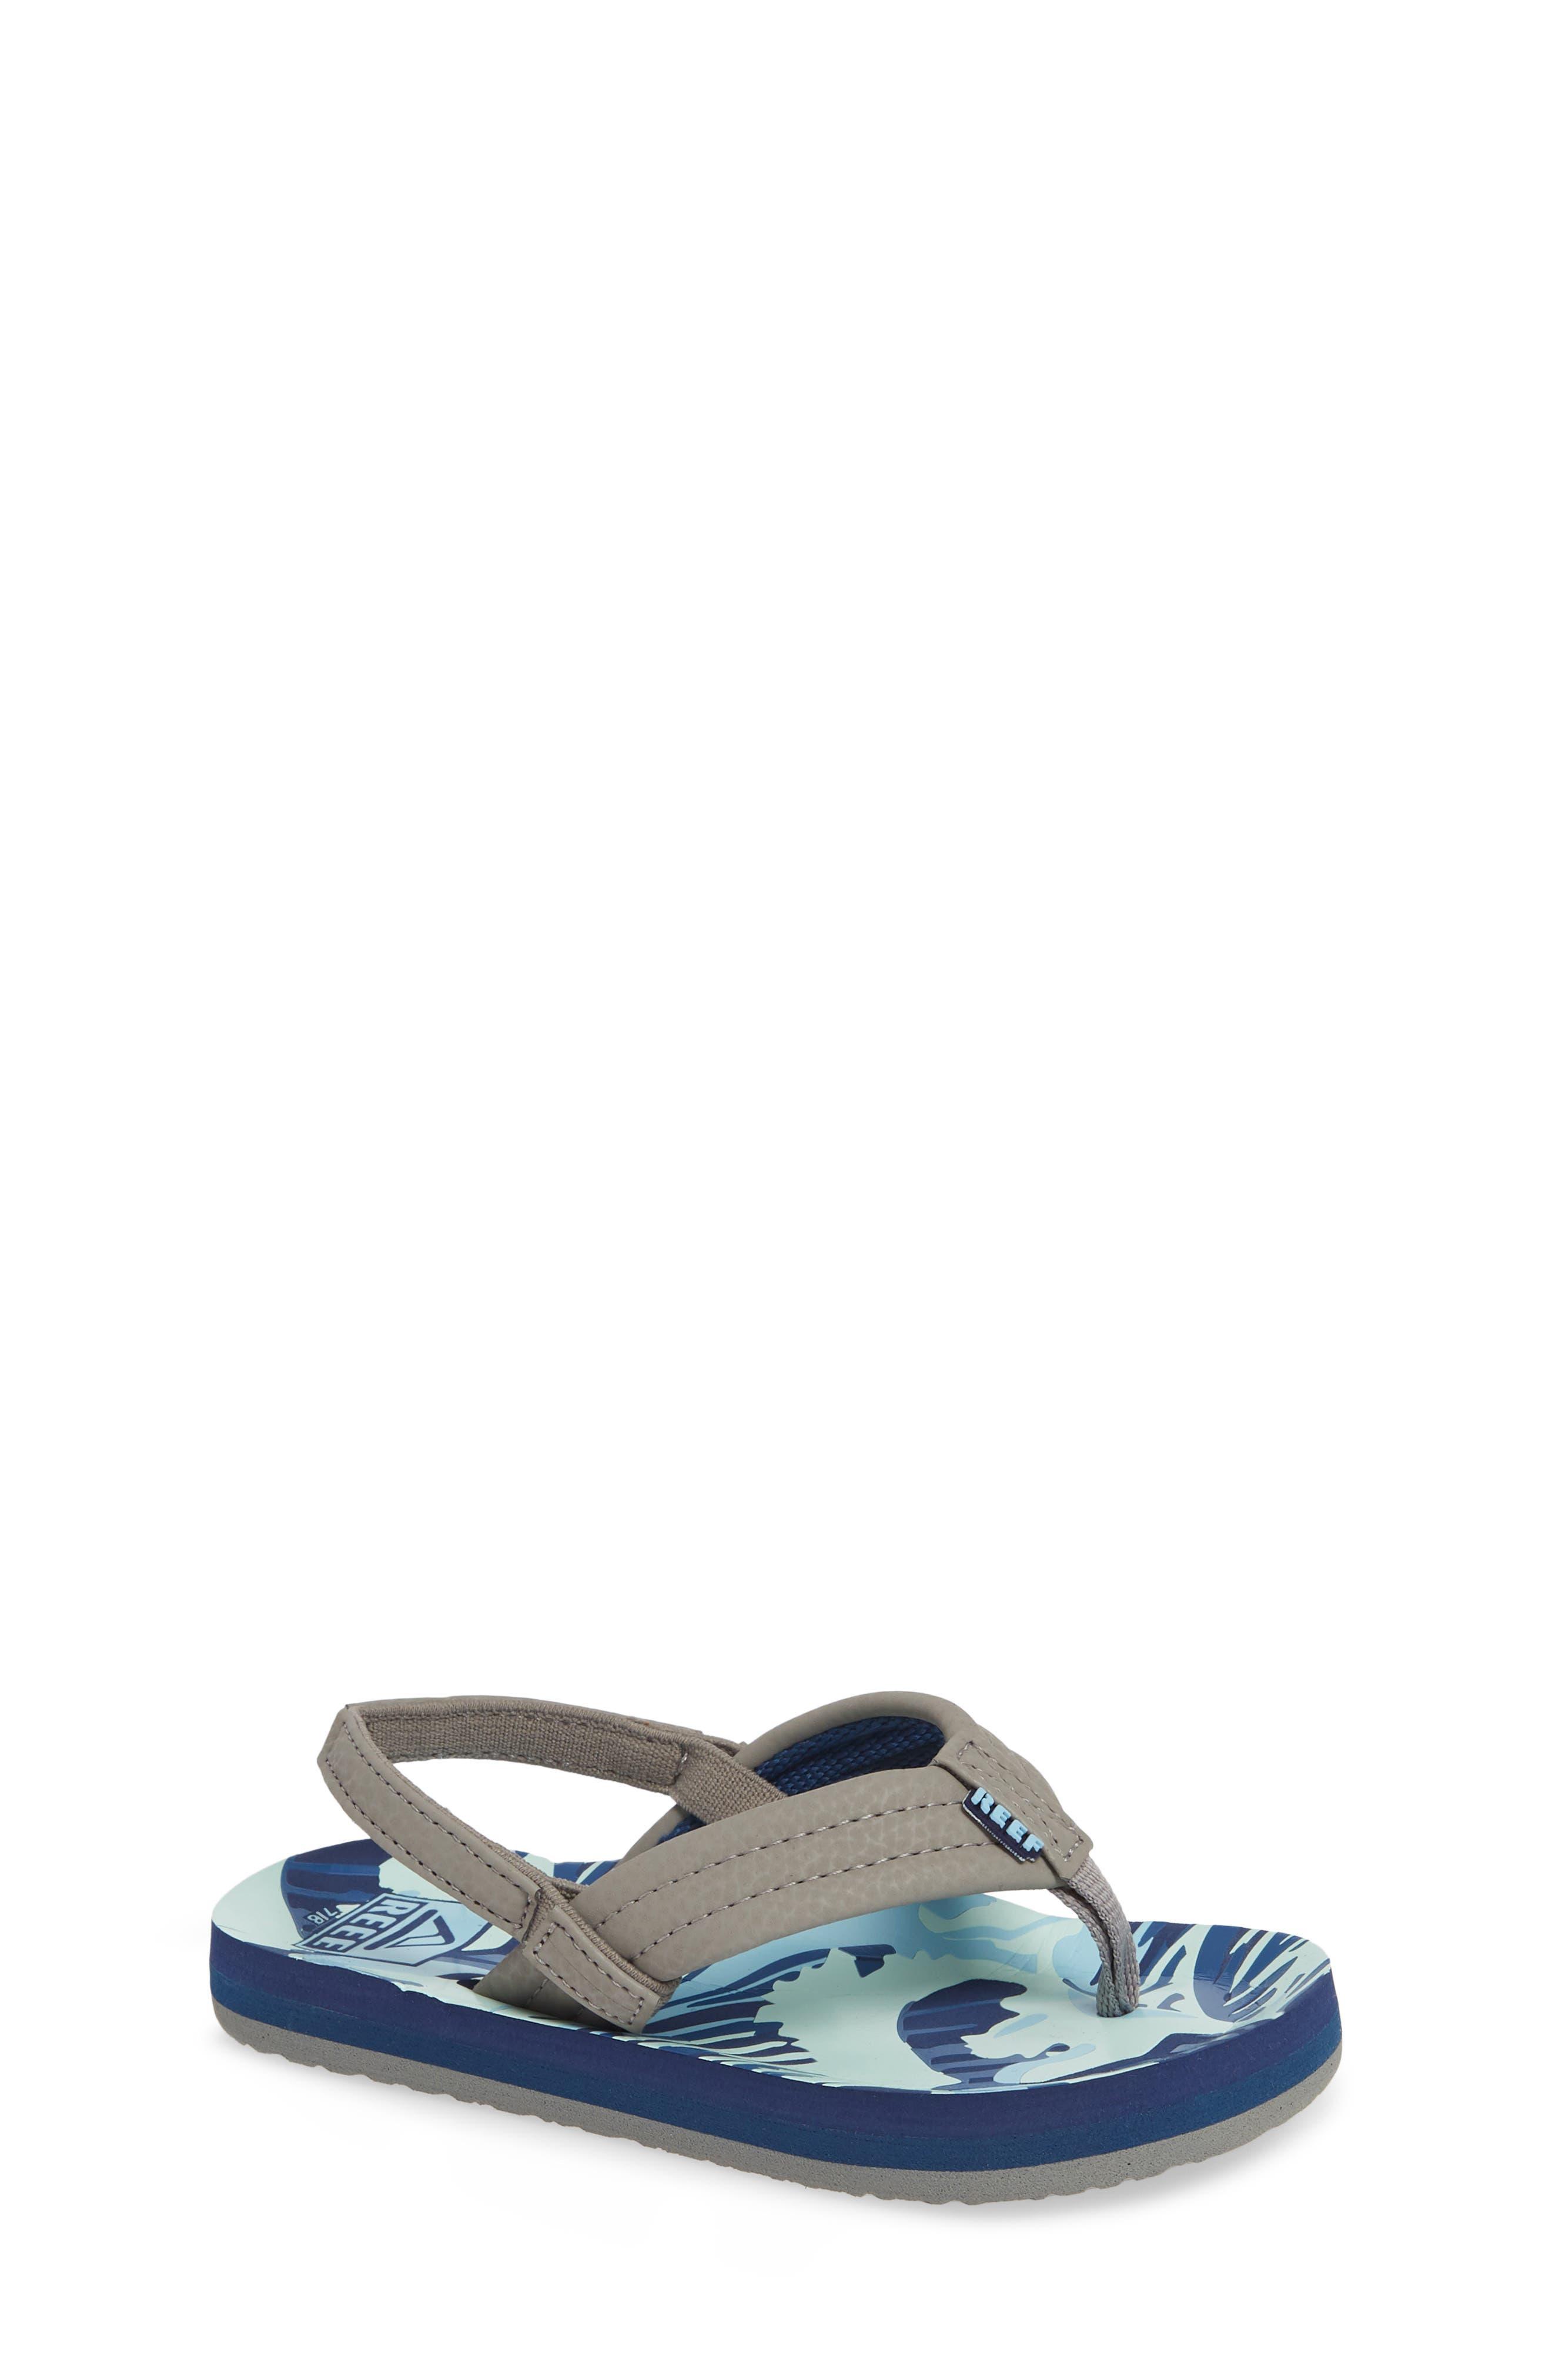 REEF, 'Ahi' Sandal, Main thumbnail 1, color, BLUE